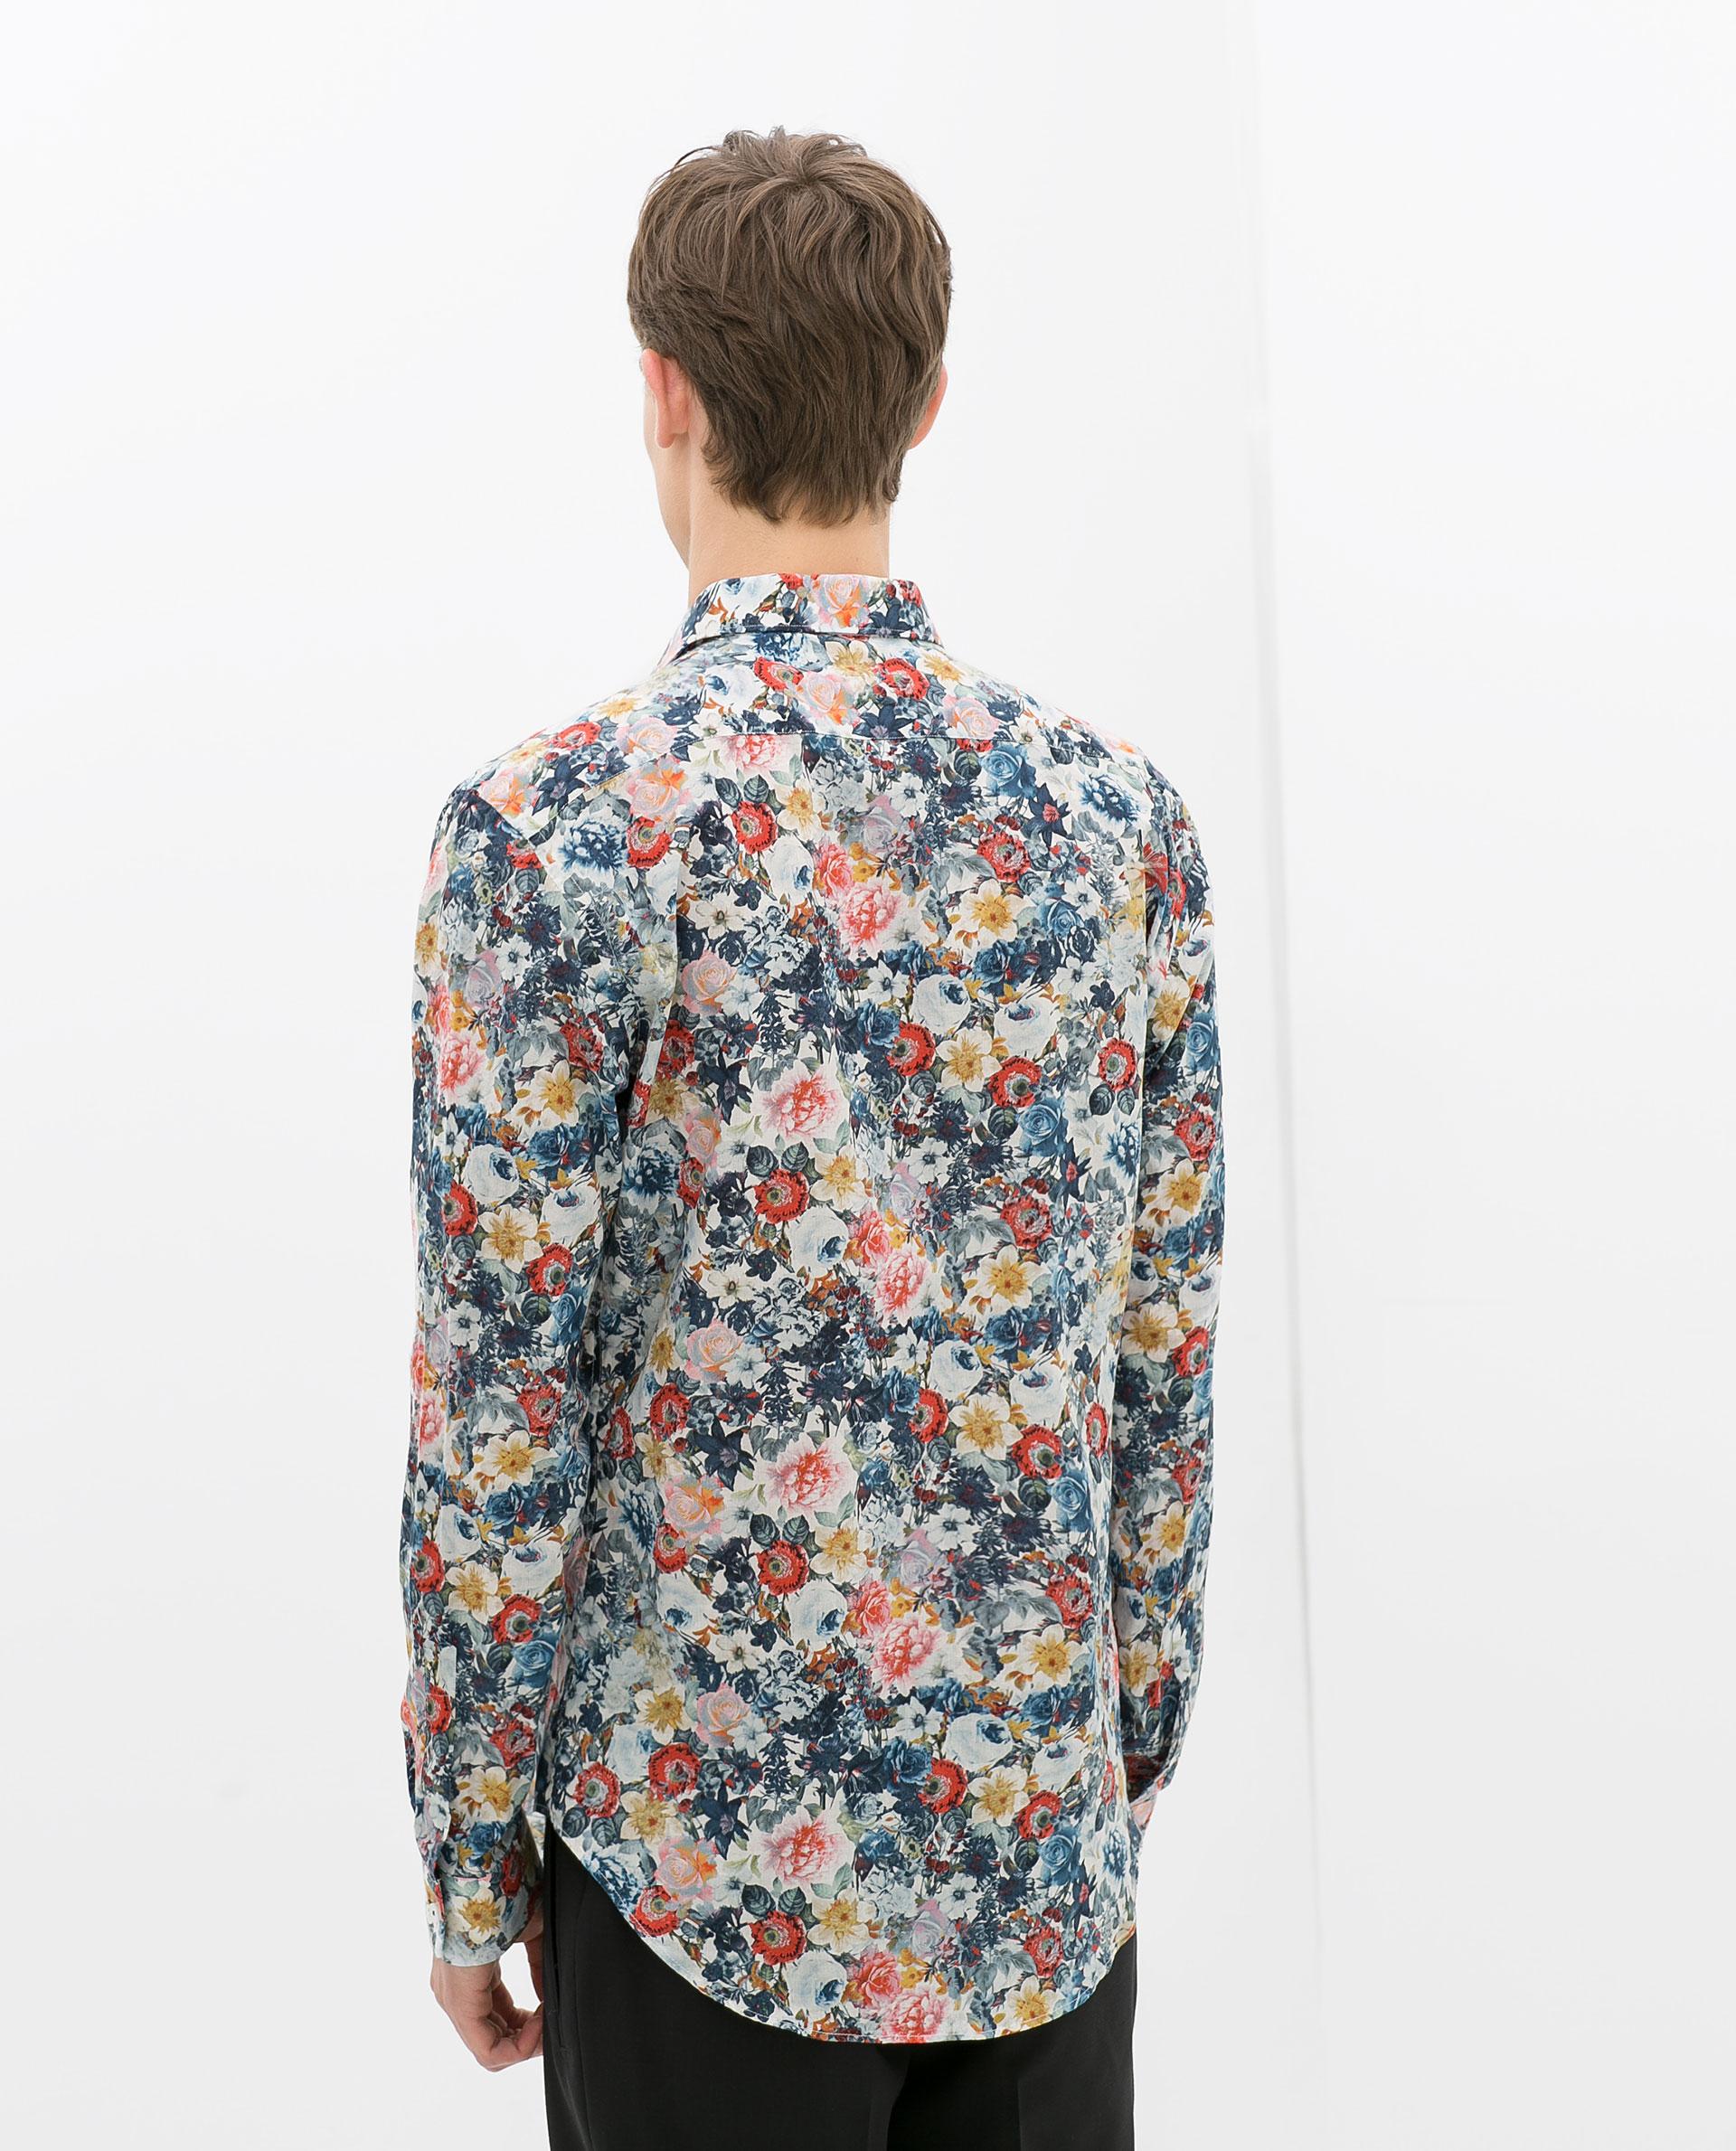 Zara Shirts T Shirt Design 2018